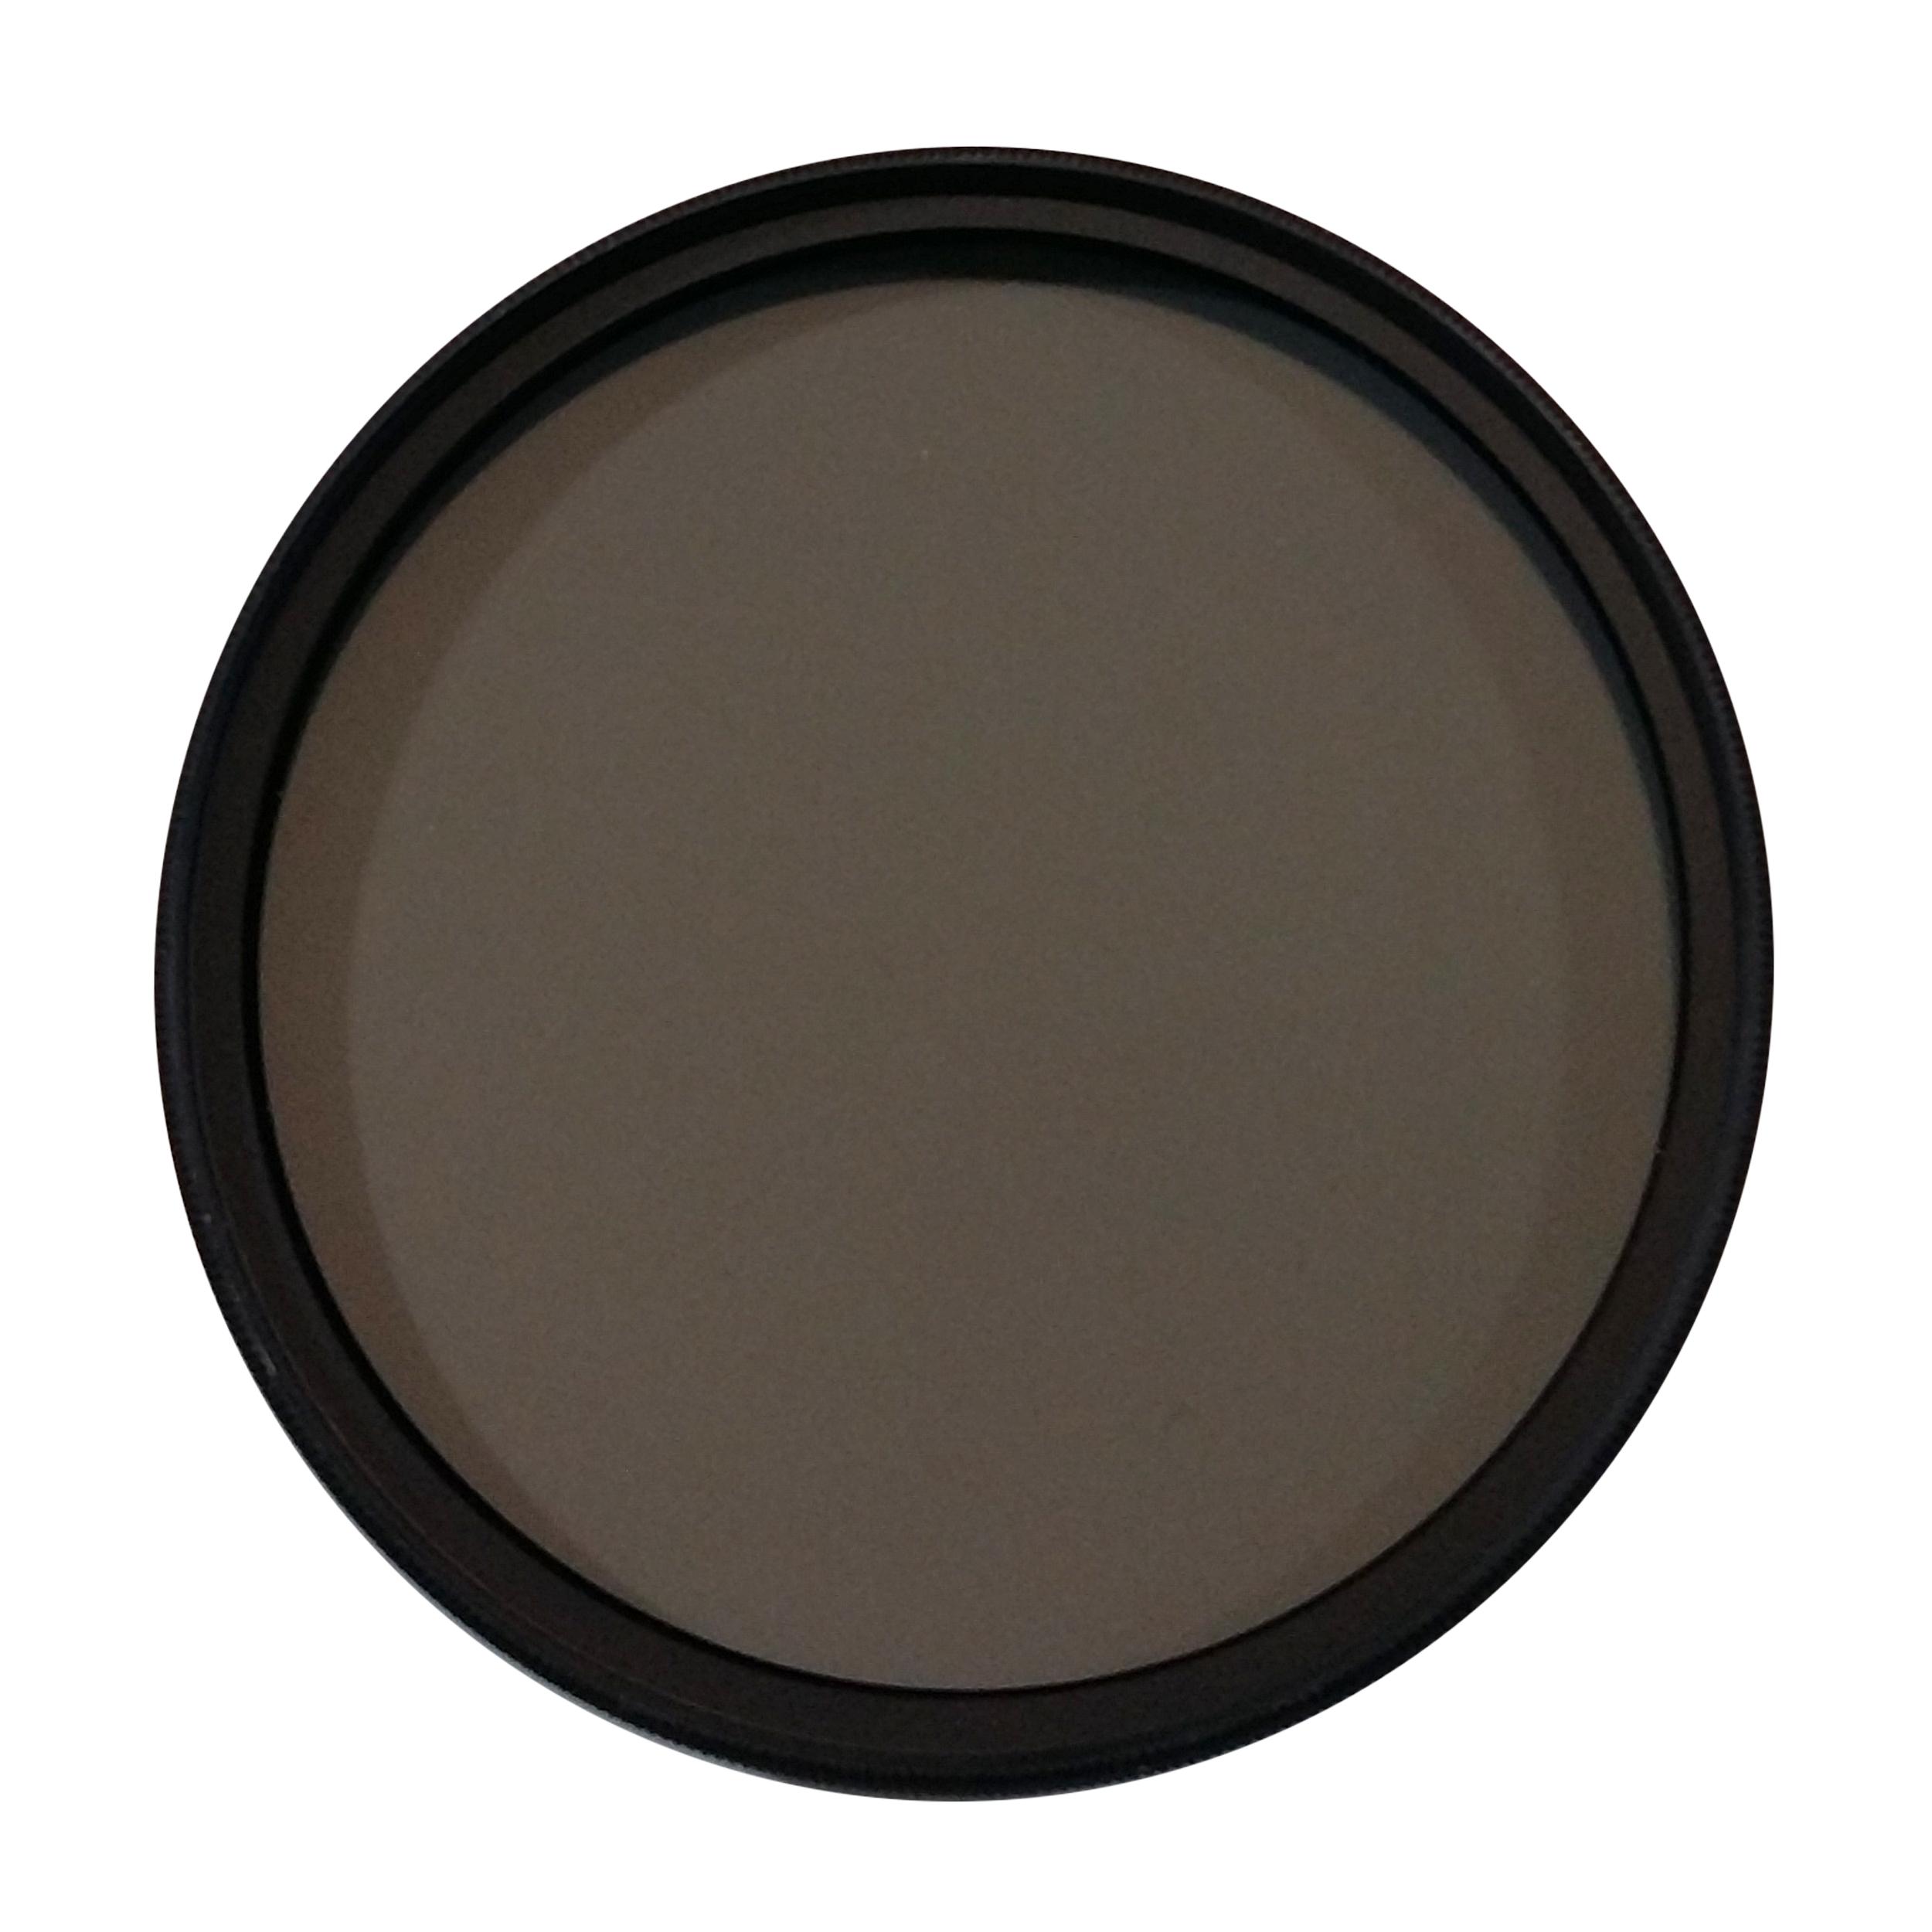 فیلتر لنز گرین ال مدل Slim CPL Gray vario 55mm